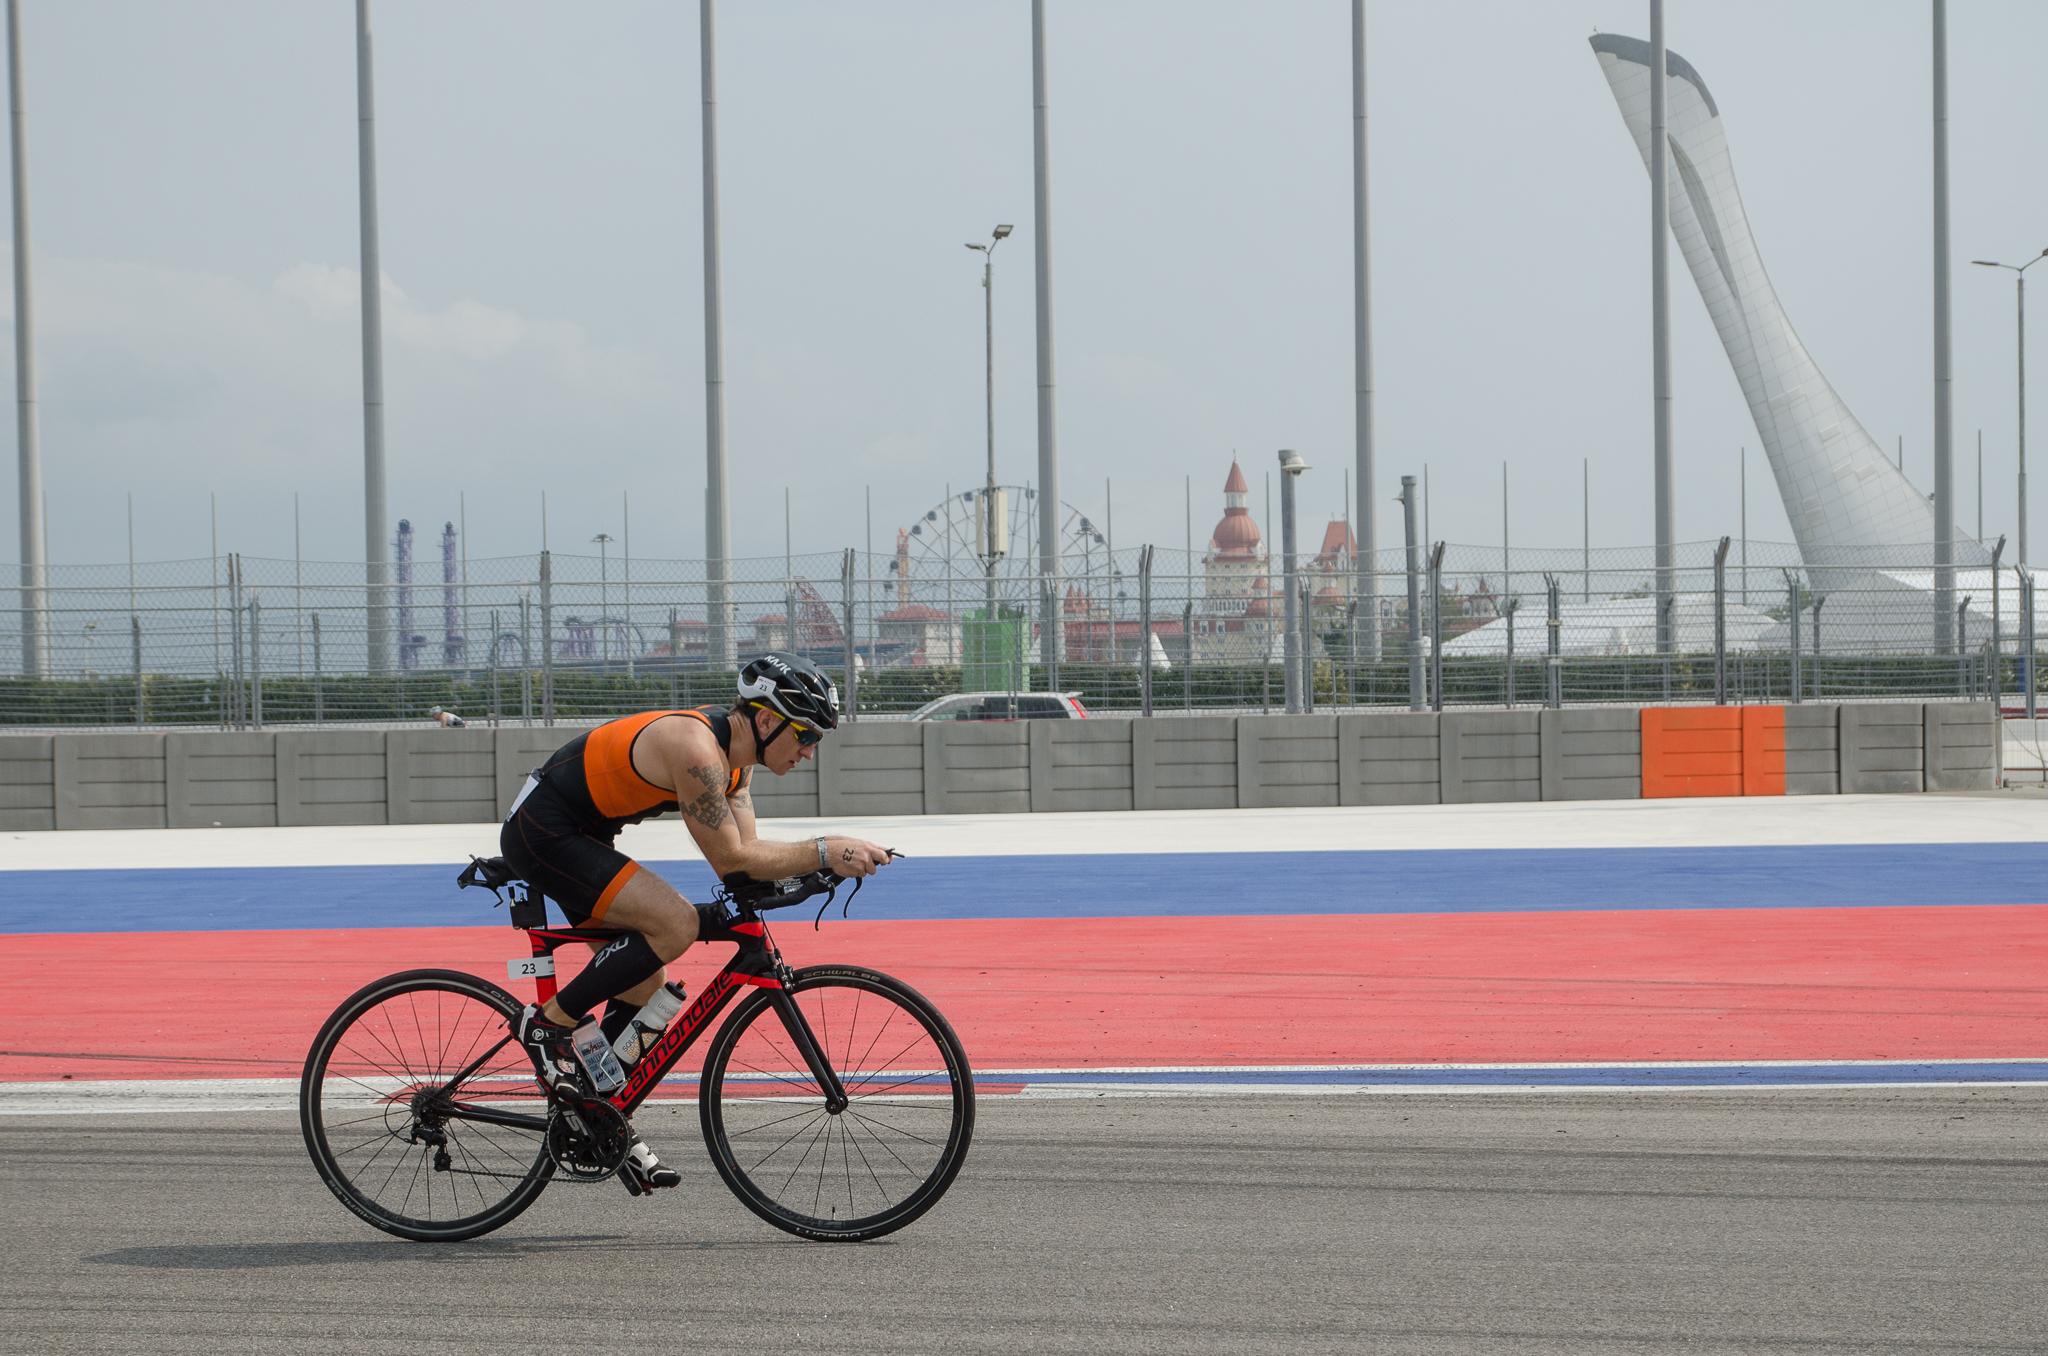 По трассе Формула-1 Сочи на велосипеде